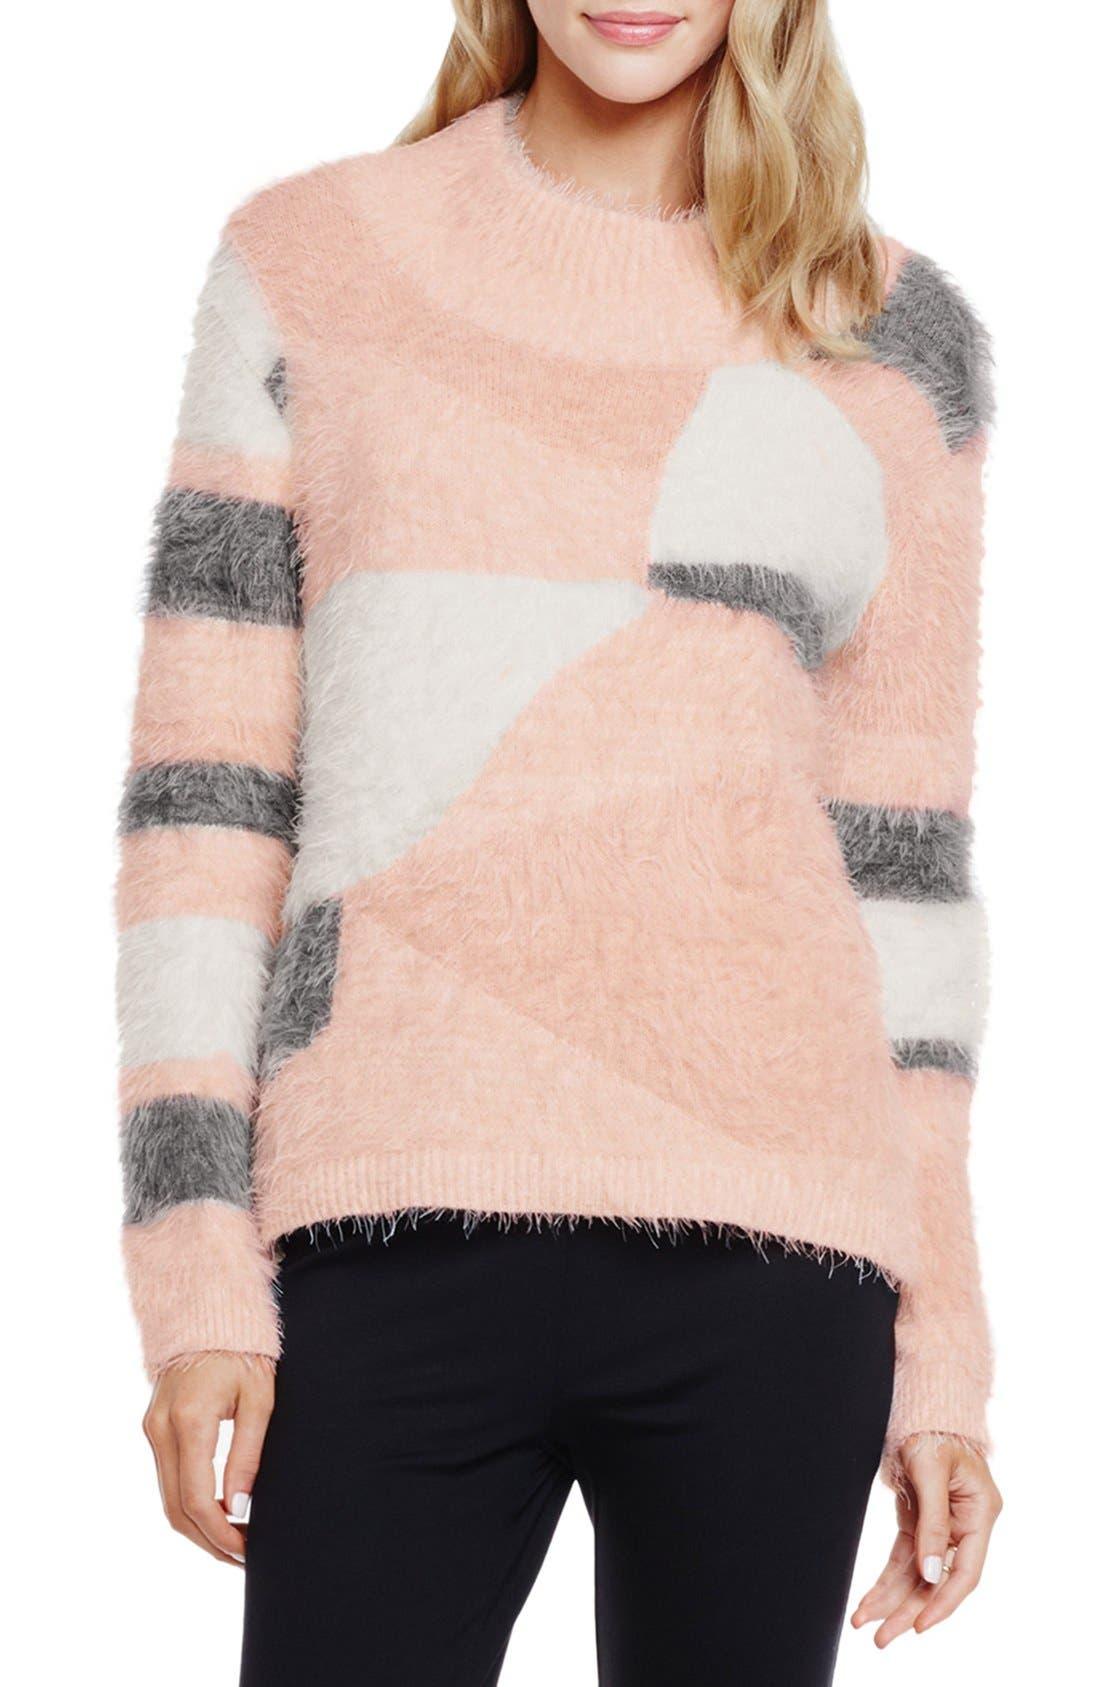 Main Image - Vince Camuto Mixed Yarn Intarsia Turtleneck Eyelash Sweater